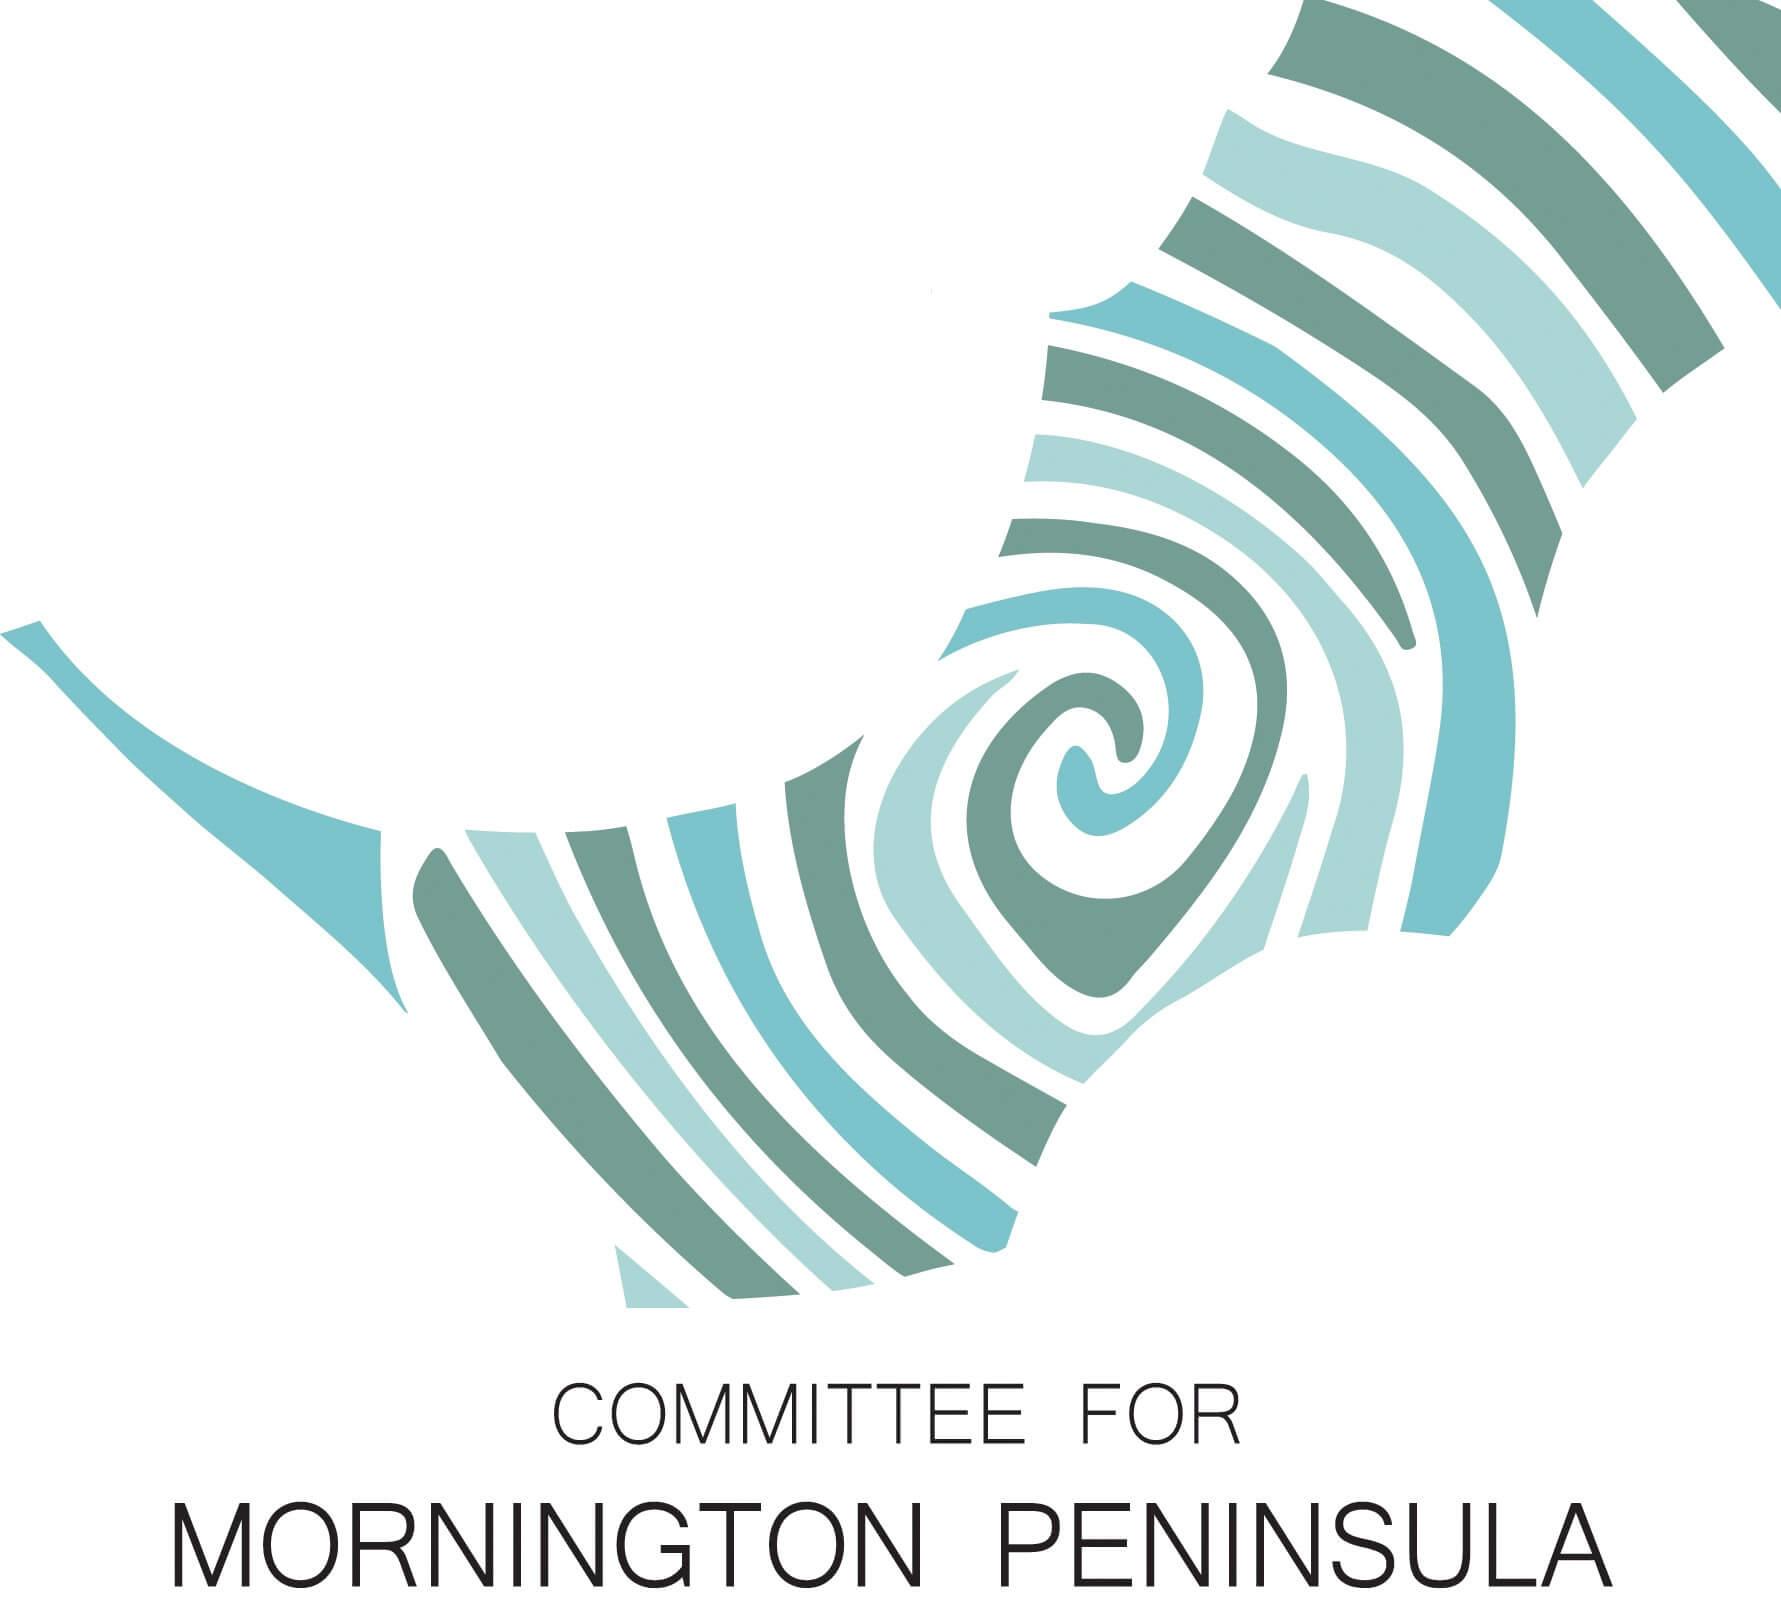 Committee for Mornington Peninsula